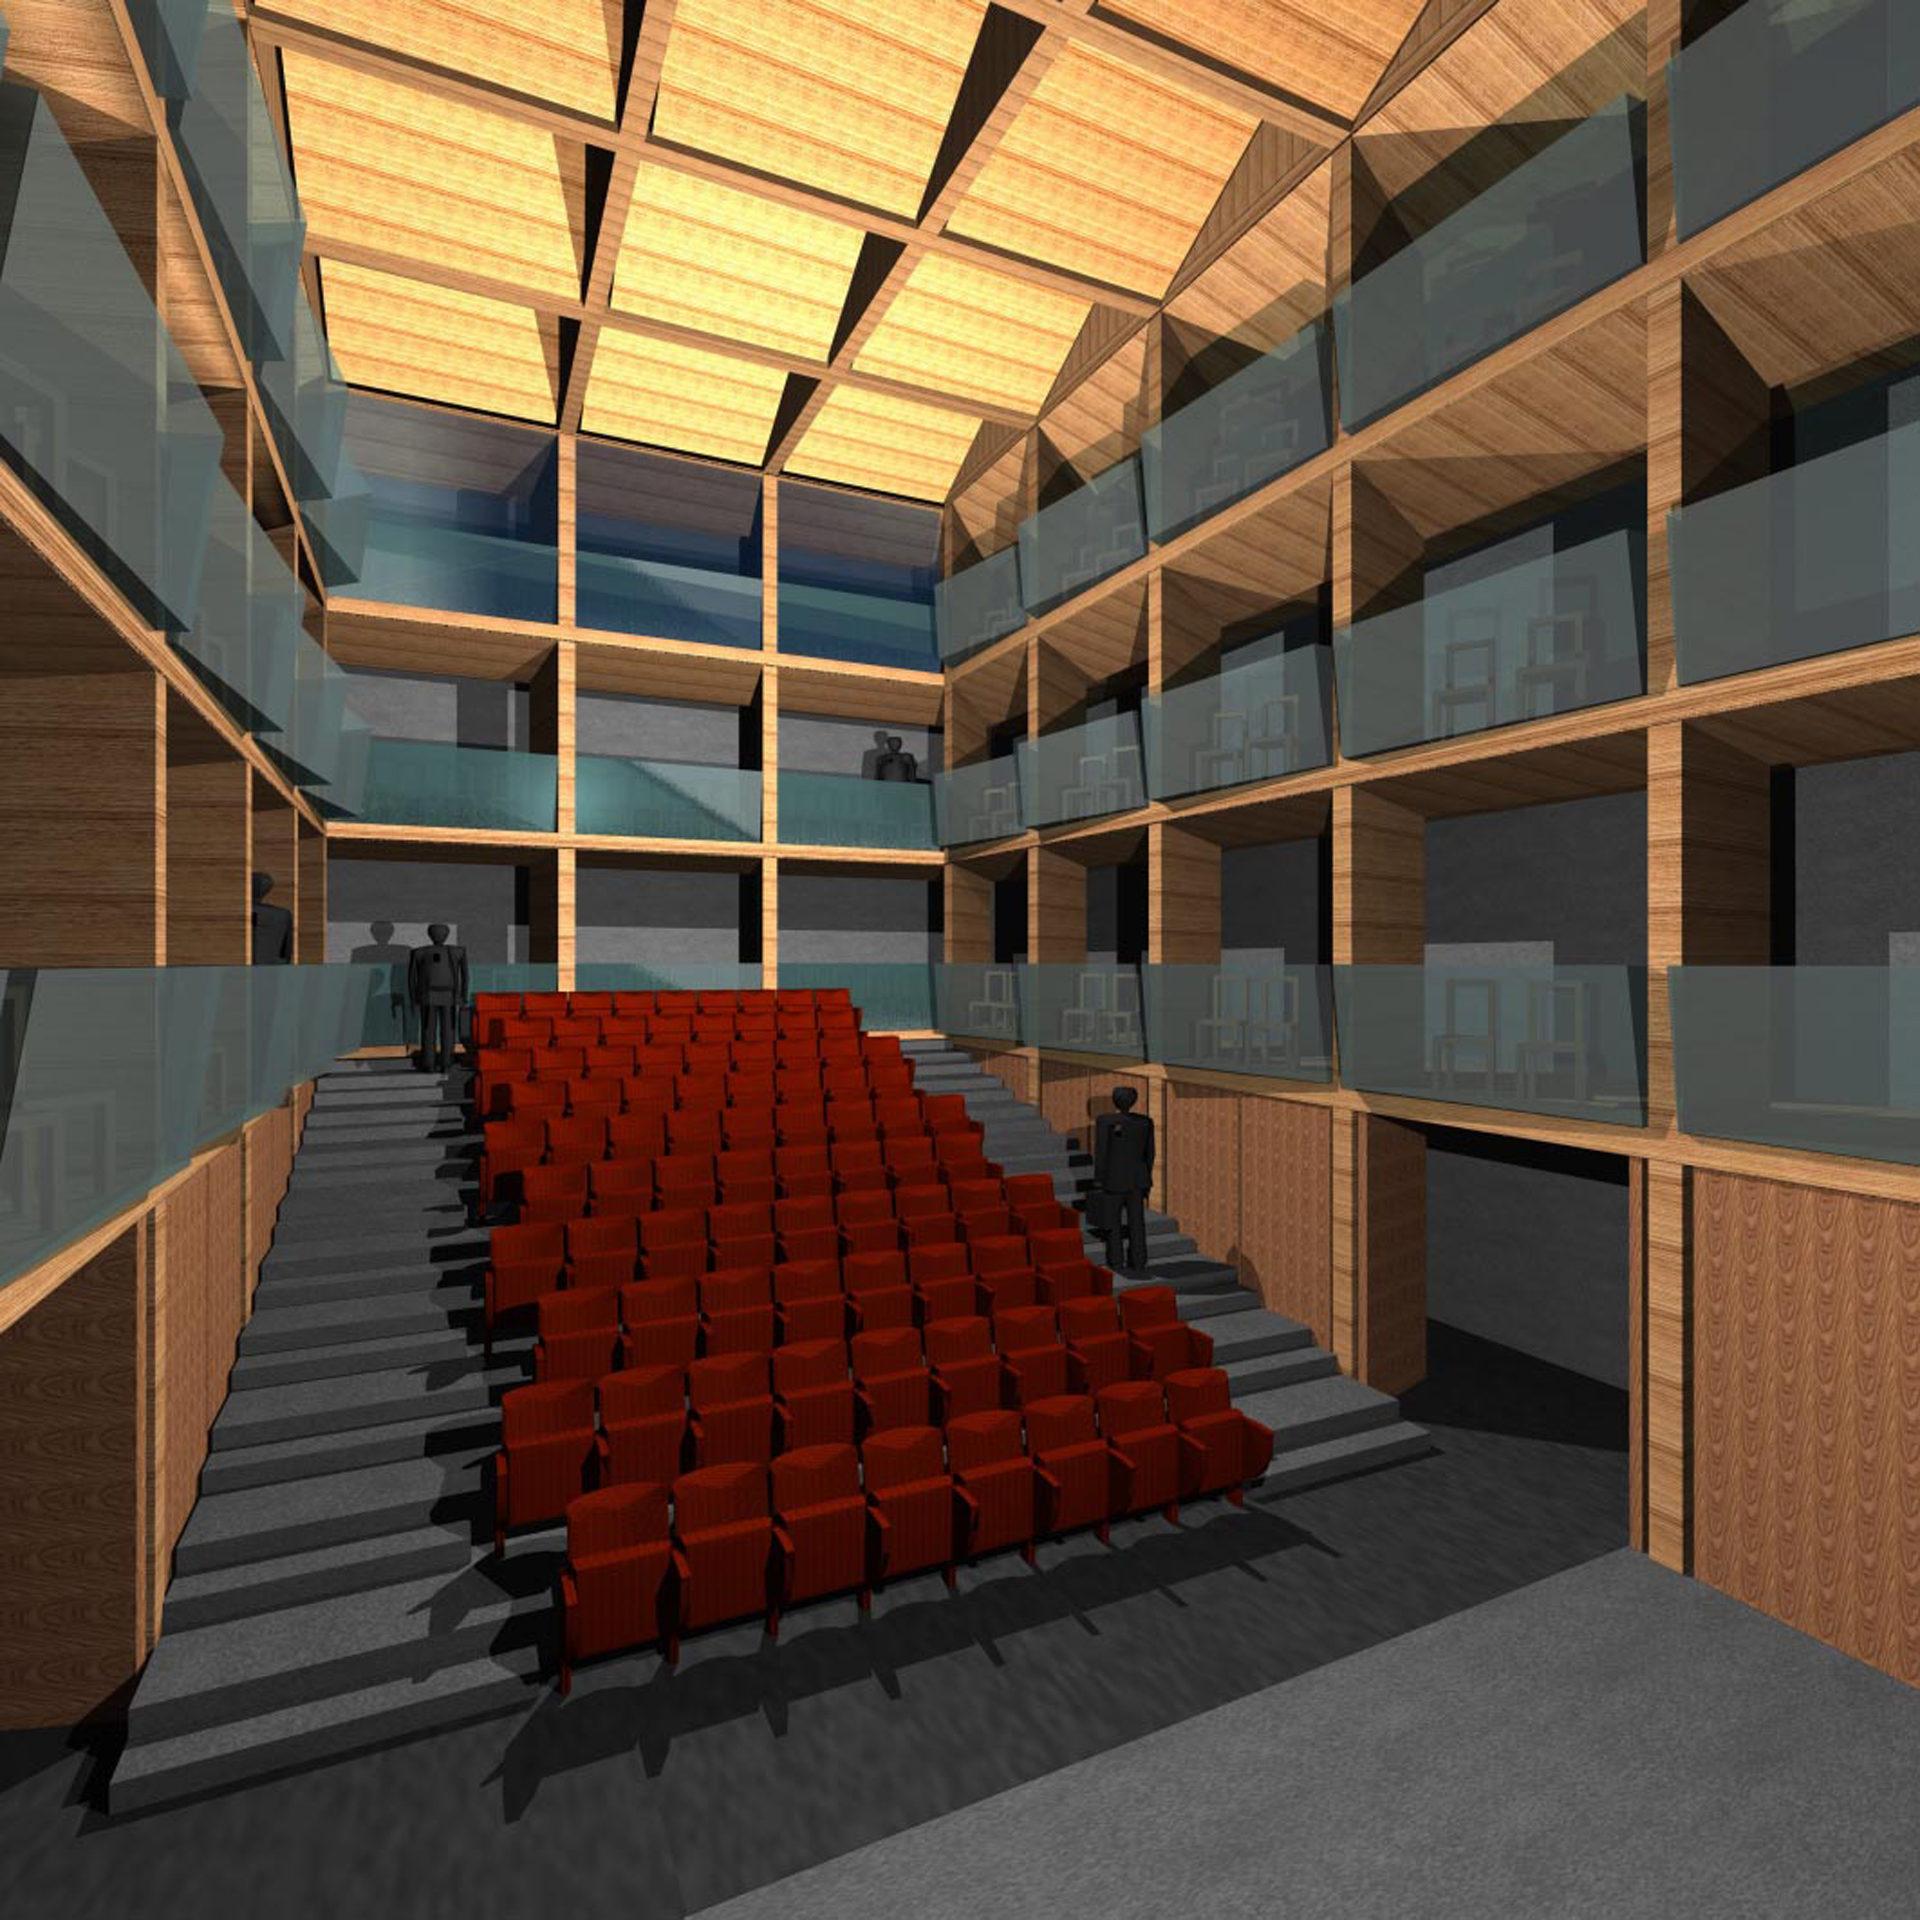 13_rekonstrukce-divadla-reduta-v-brne